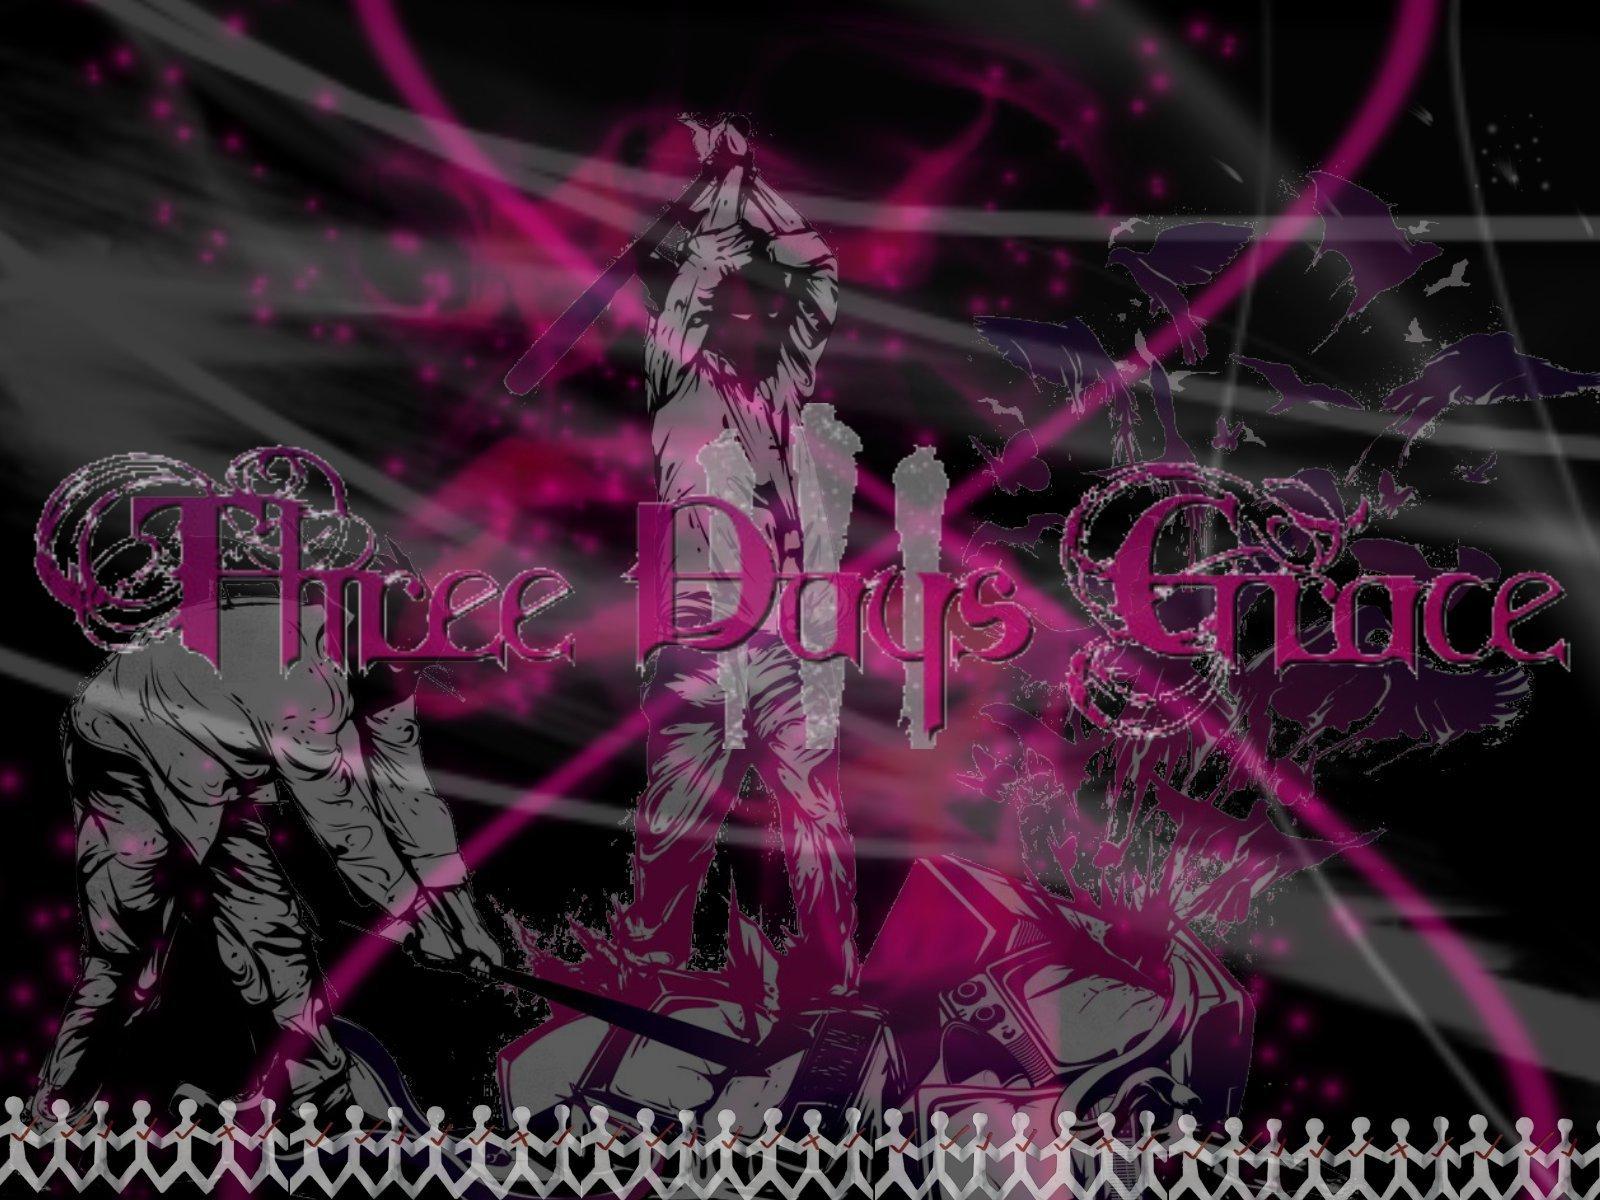 Three Days Grace everything three days grace 21768733 1600 1200jpg 1600x1200